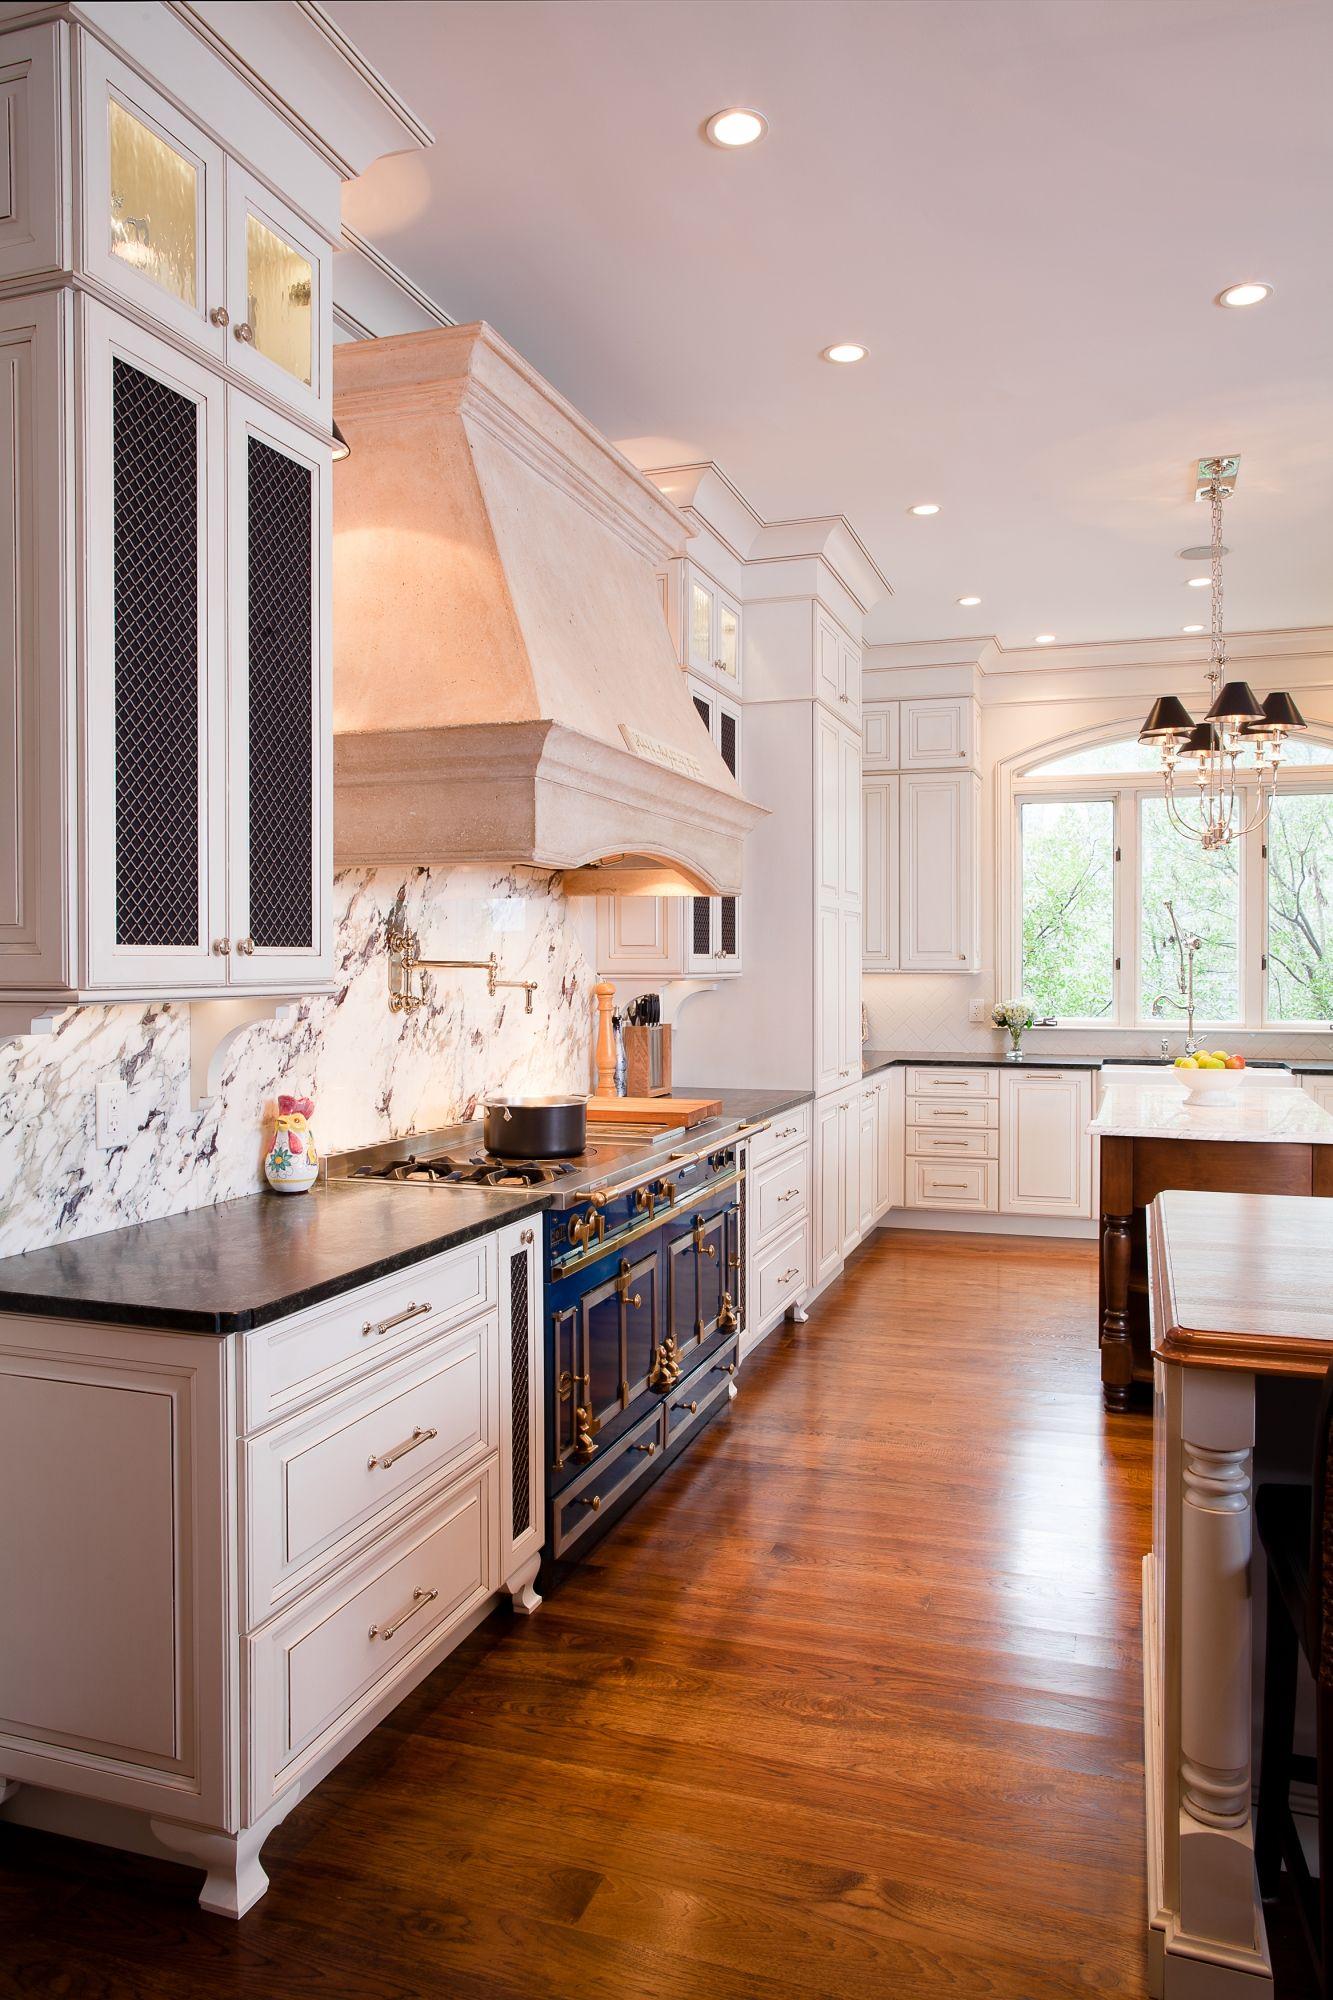 Mt paran road project cultivate home decor interior